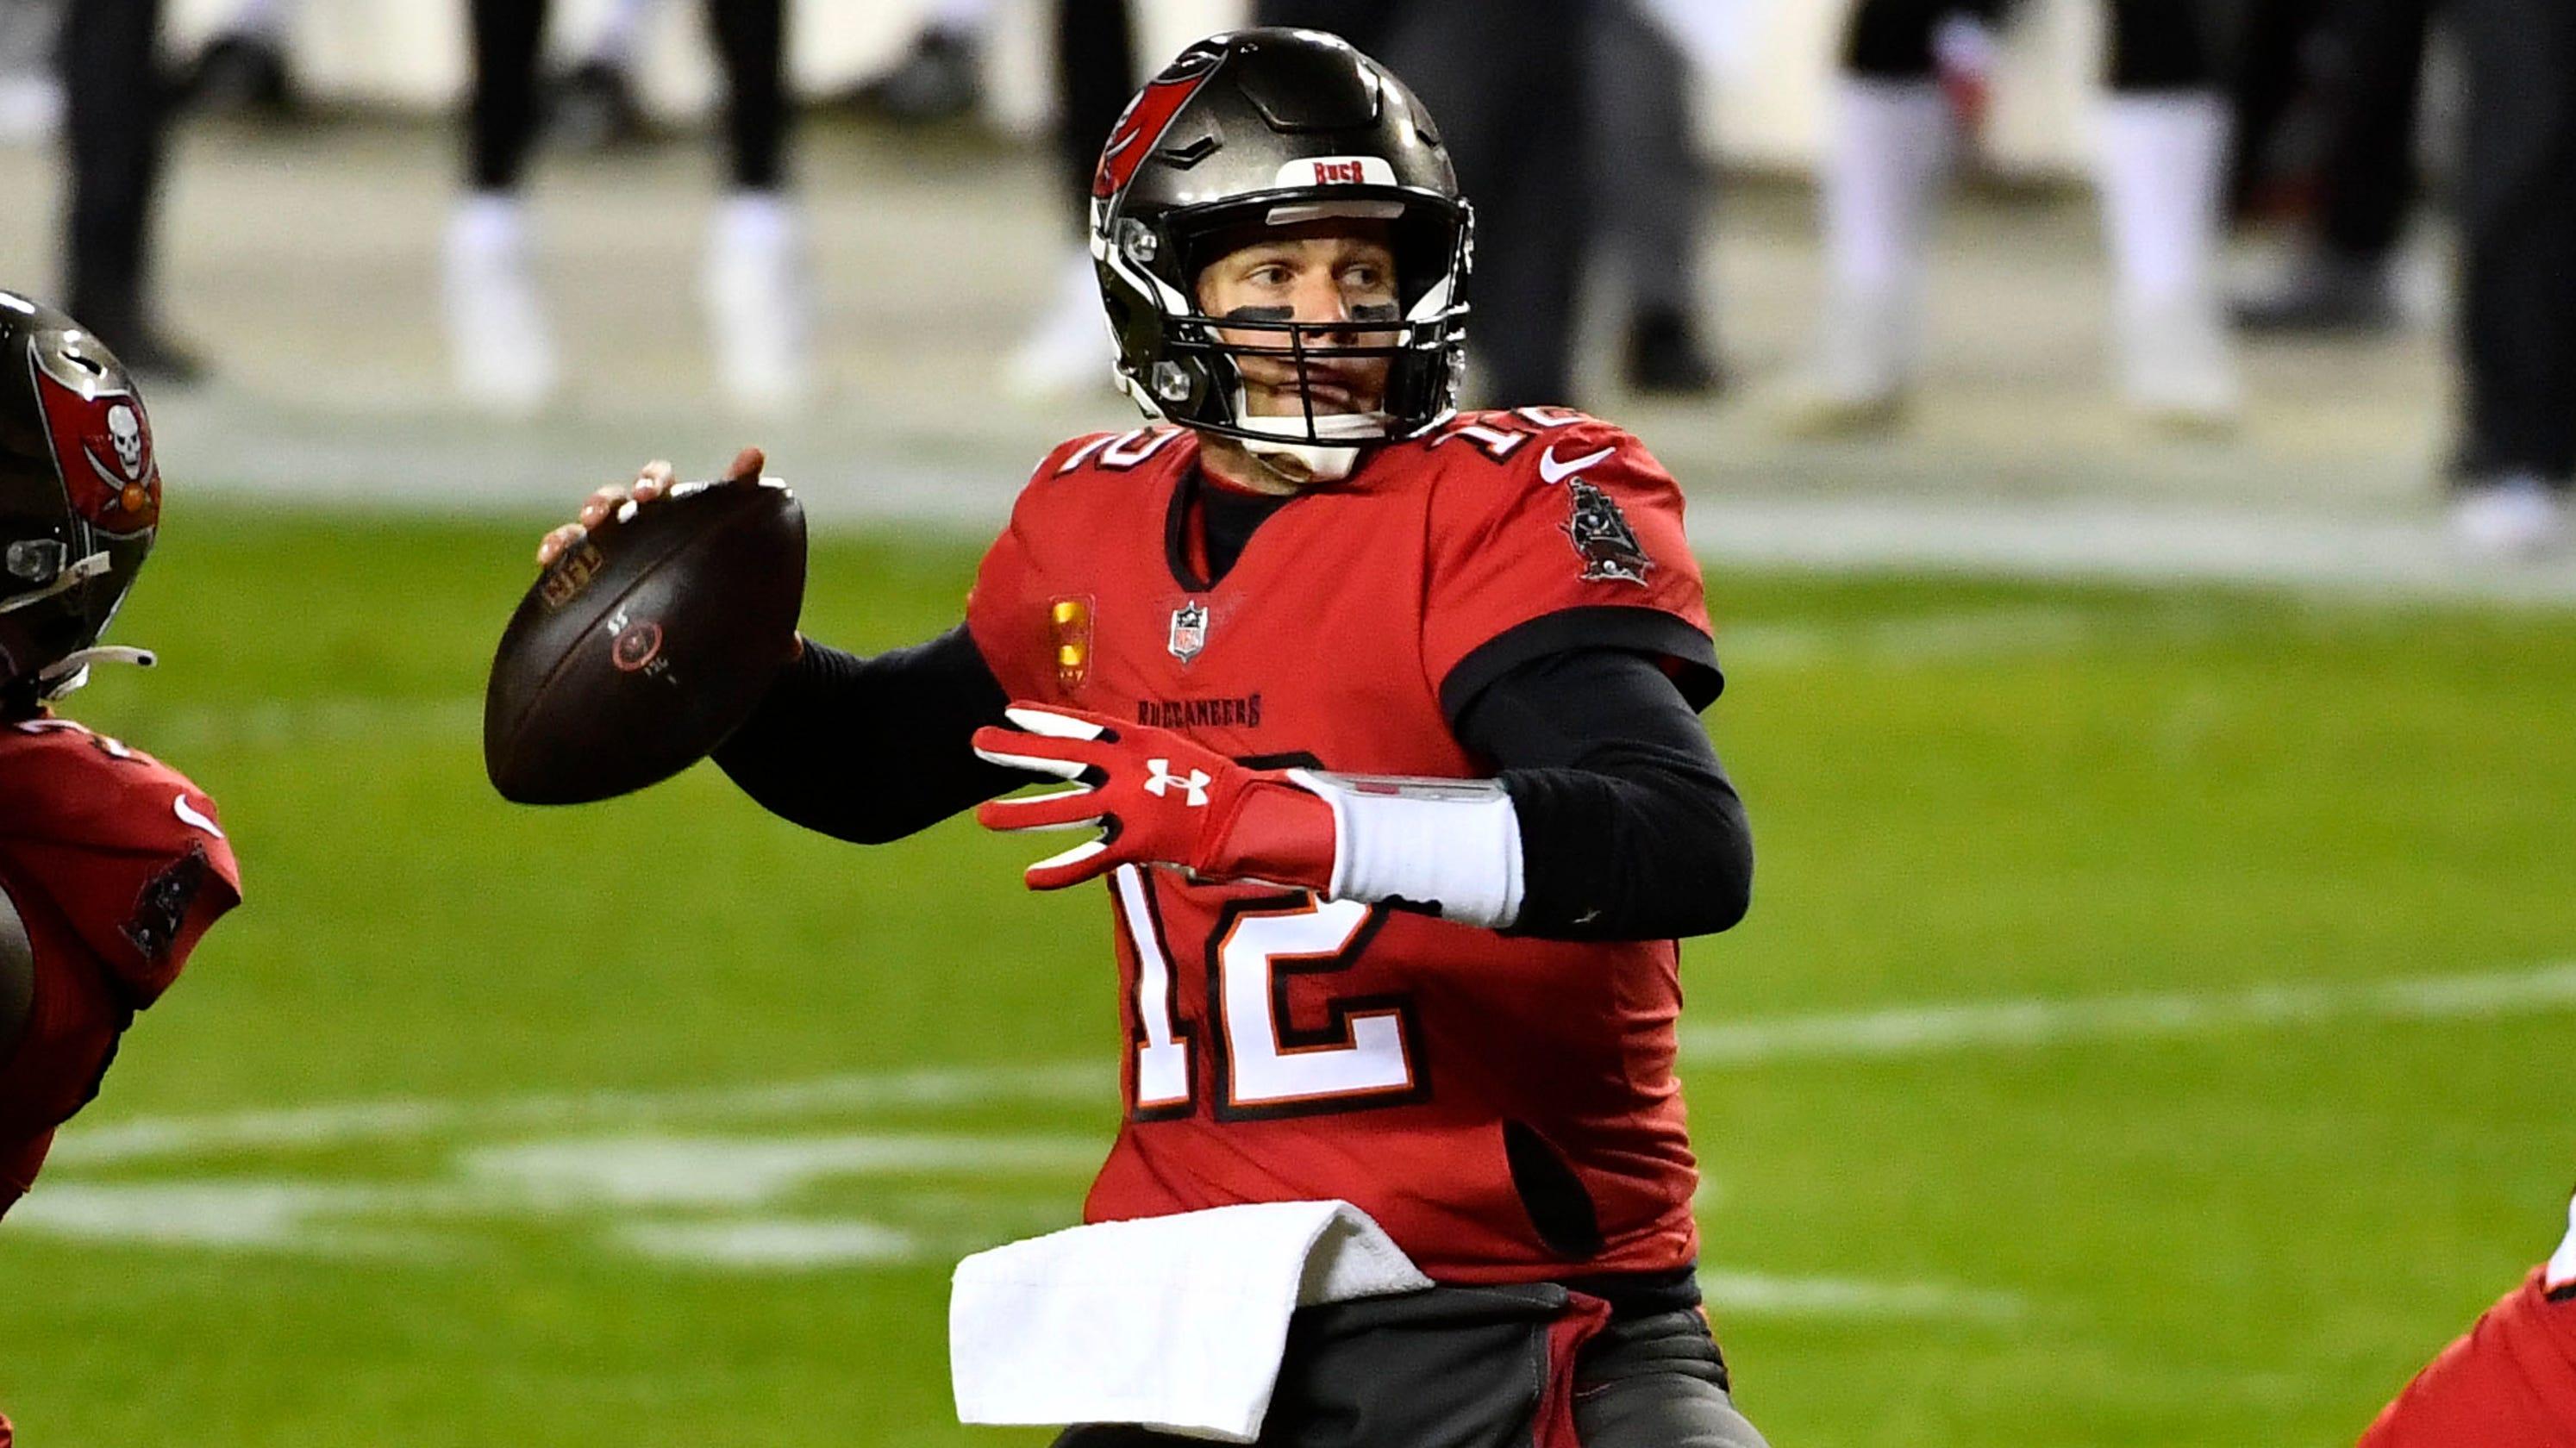 Tom Brady Tampa Bay Bucs hold off feisty Washington Football Team in NFL playoffs – USA TODAY